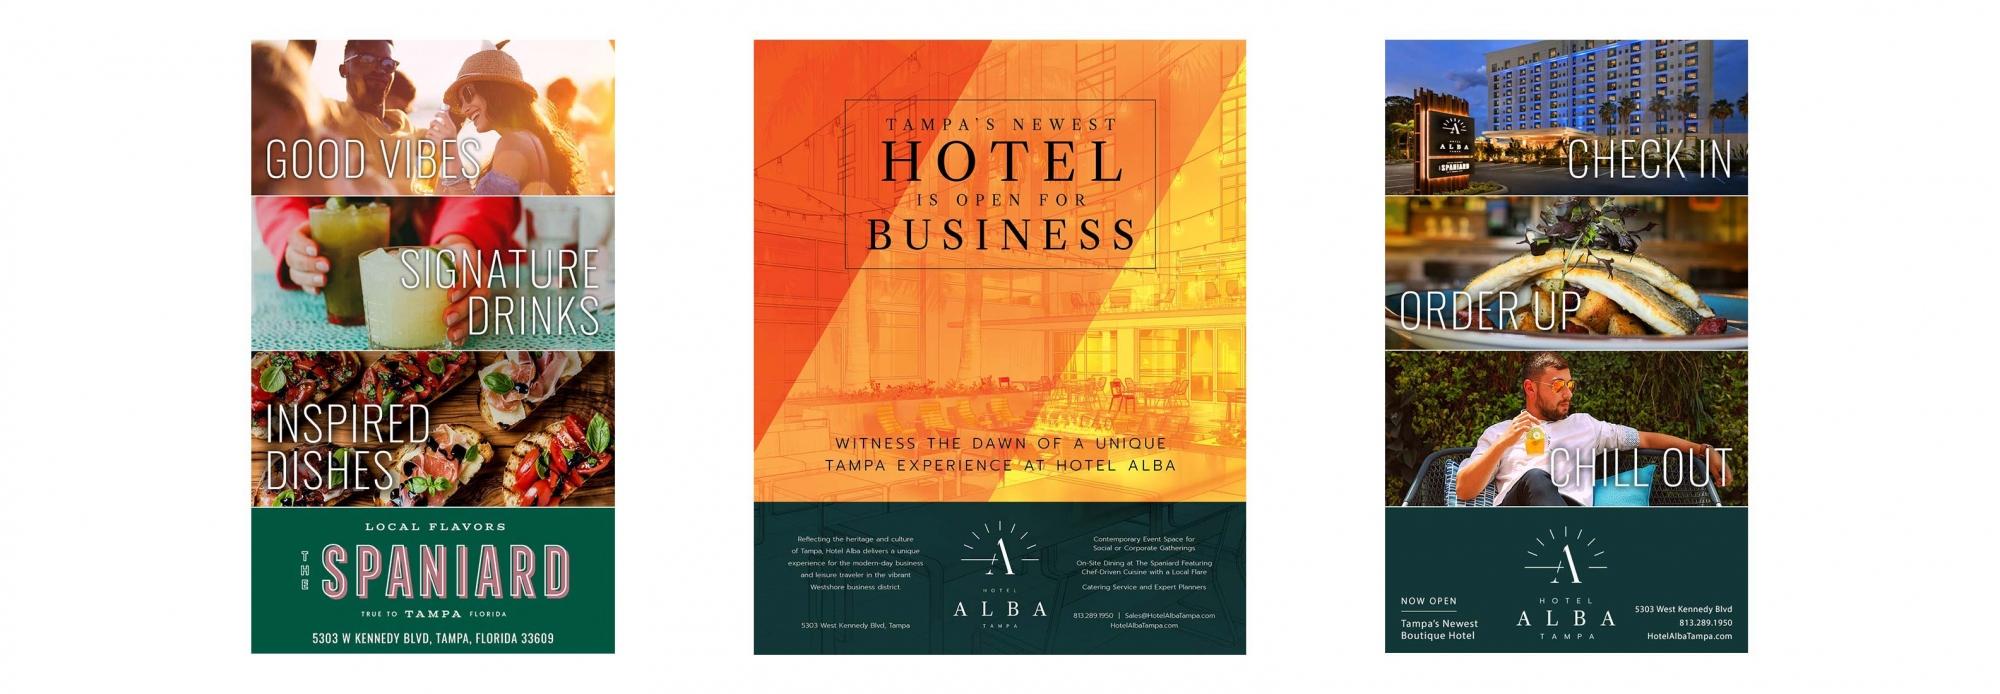 Hotel Alba Print Ads